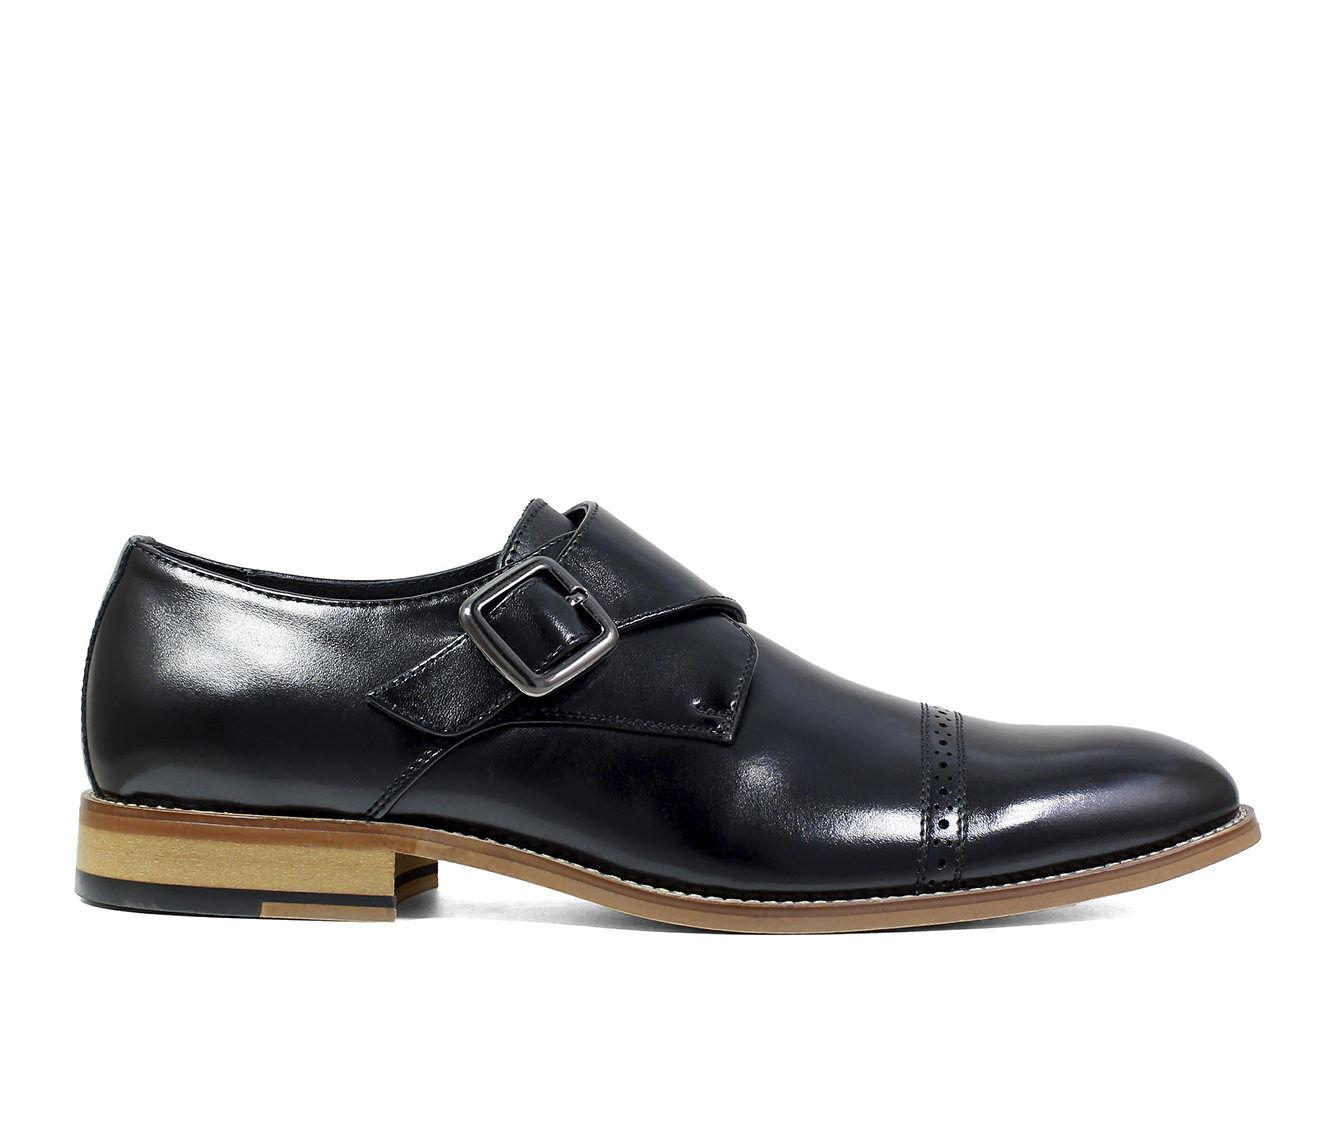 big discount Men's Stacy Adams Desmond Monk Strap Dress Loafers Black